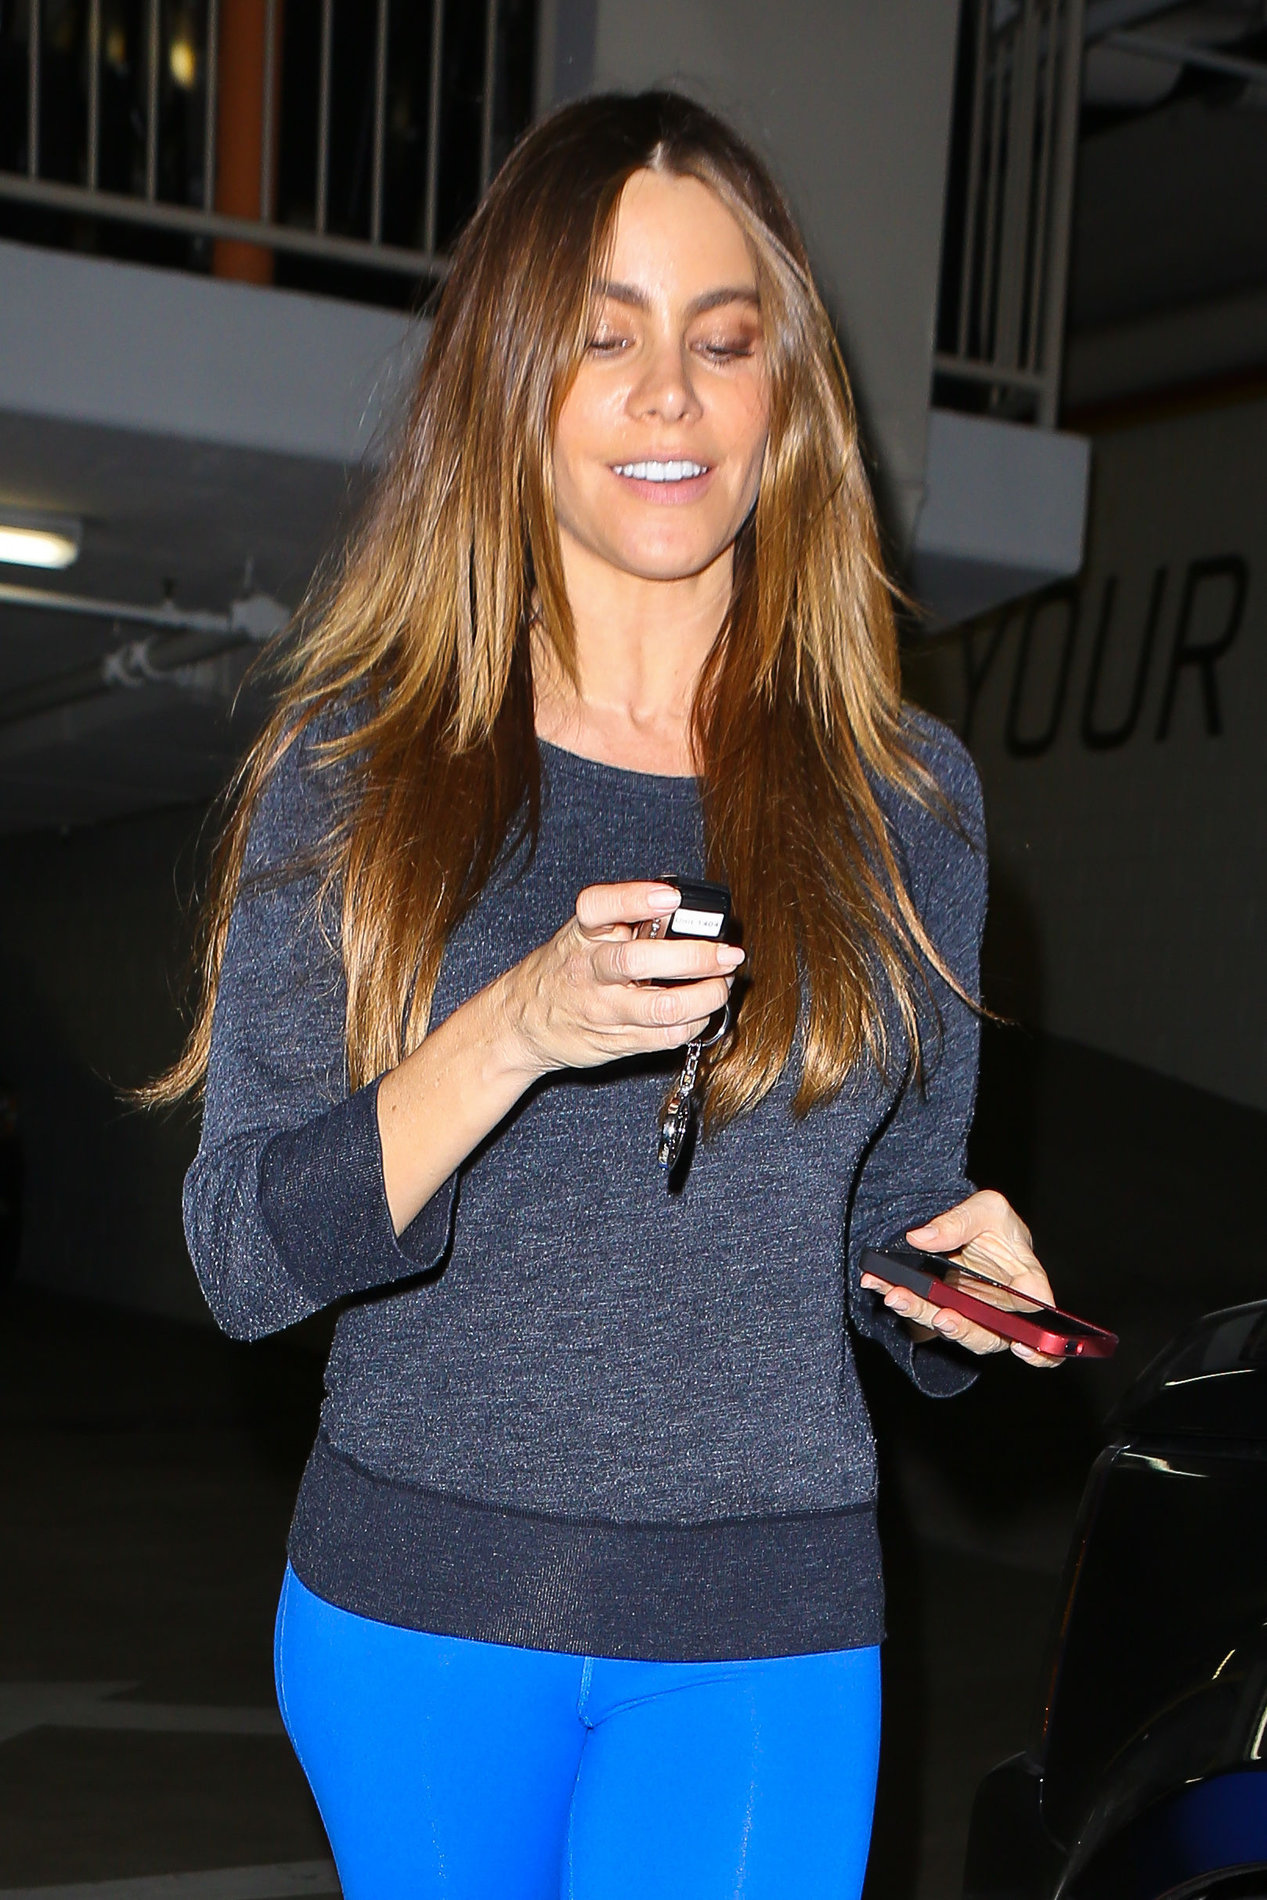 Sofia Vergara booty leaving a gym in Beverly Hills 11/7/12